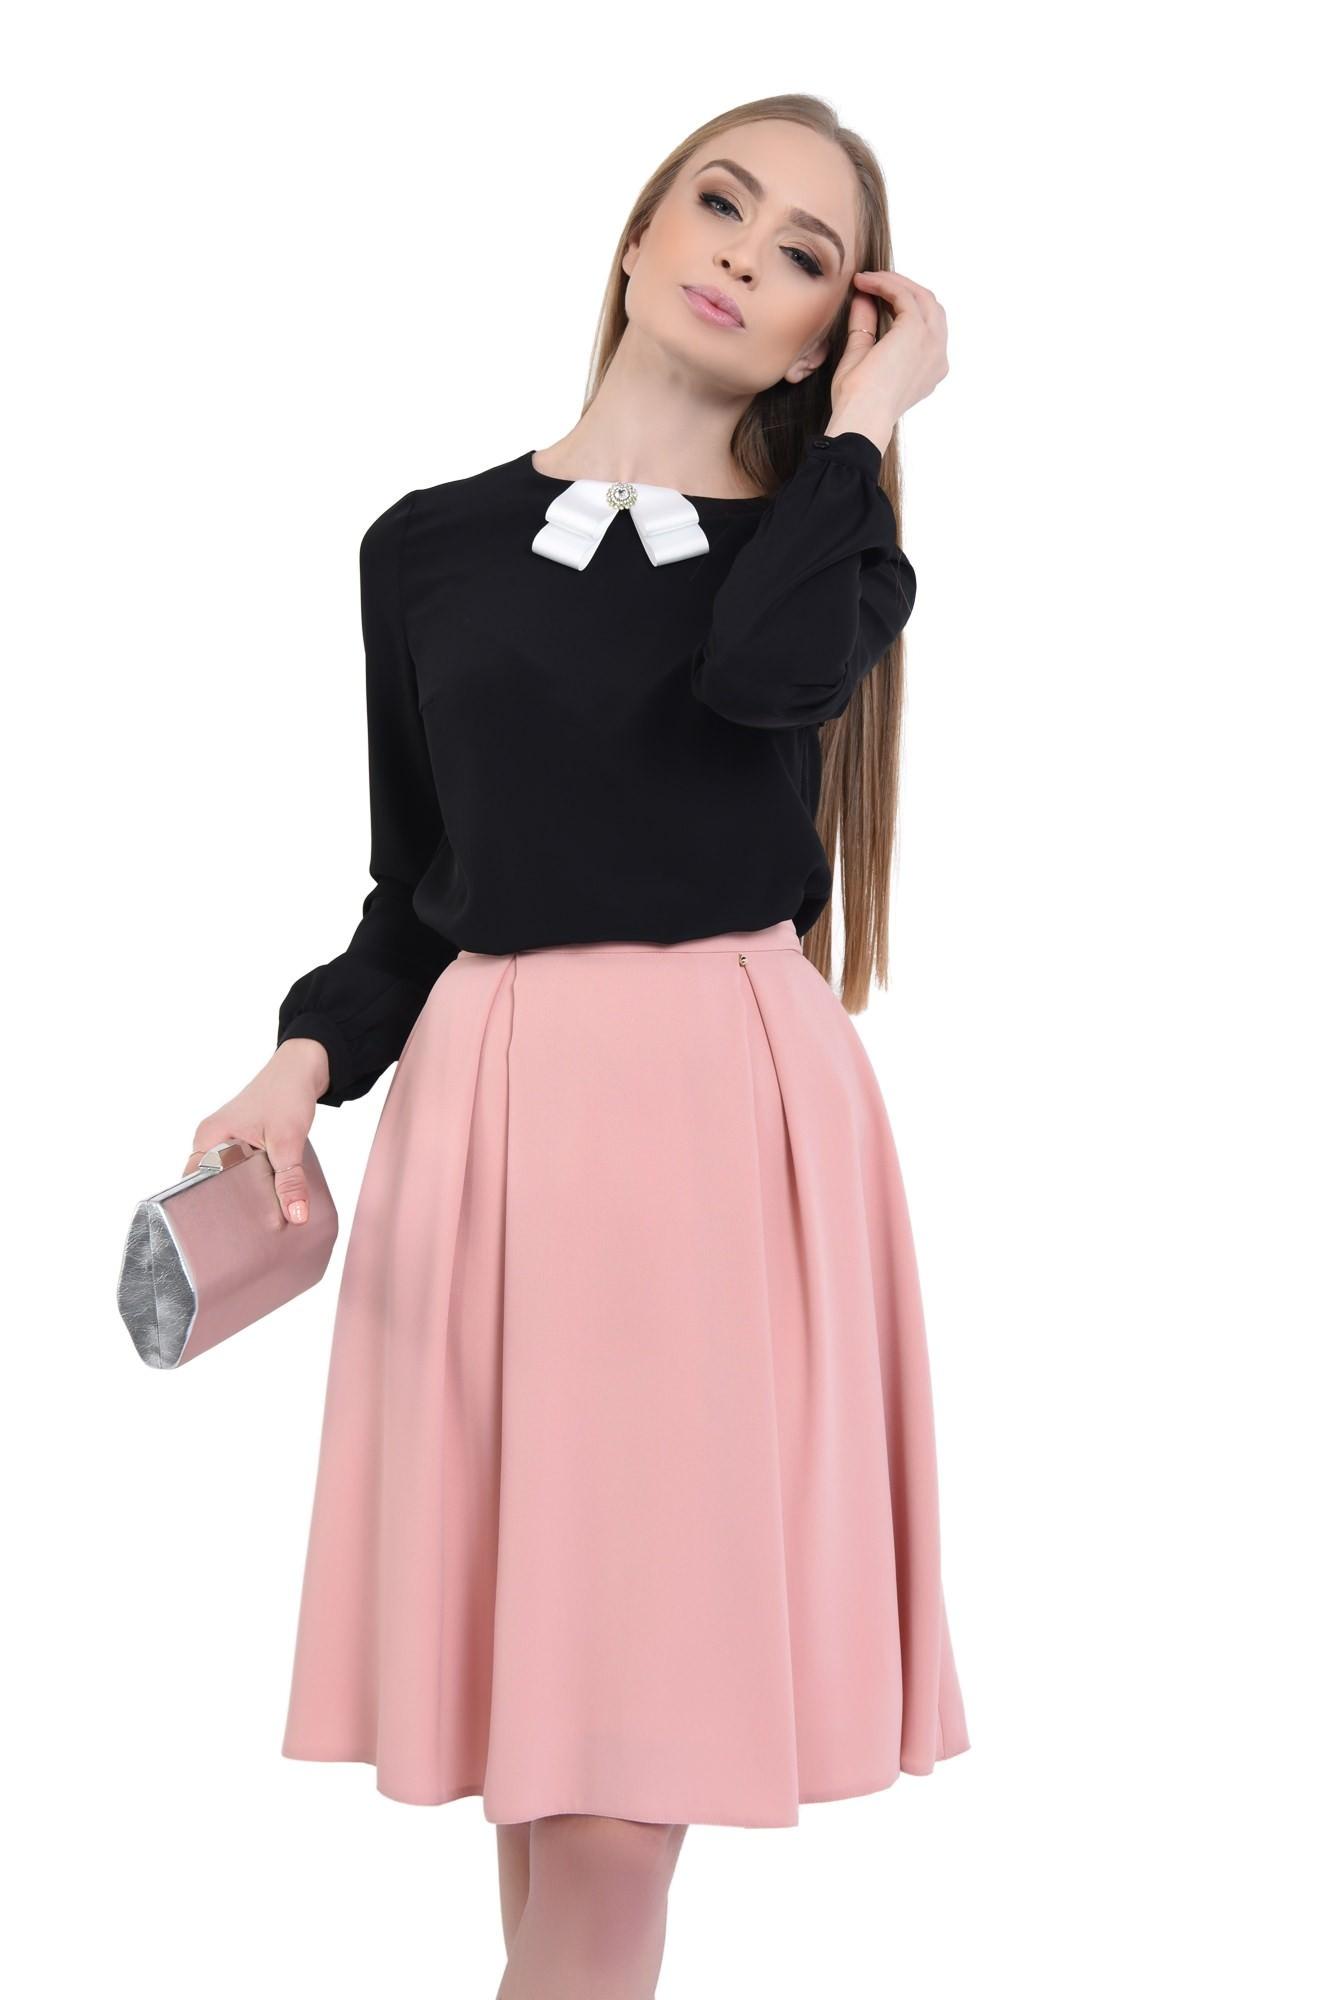 2 - Bluza din sifon, contrast, maneci lungi